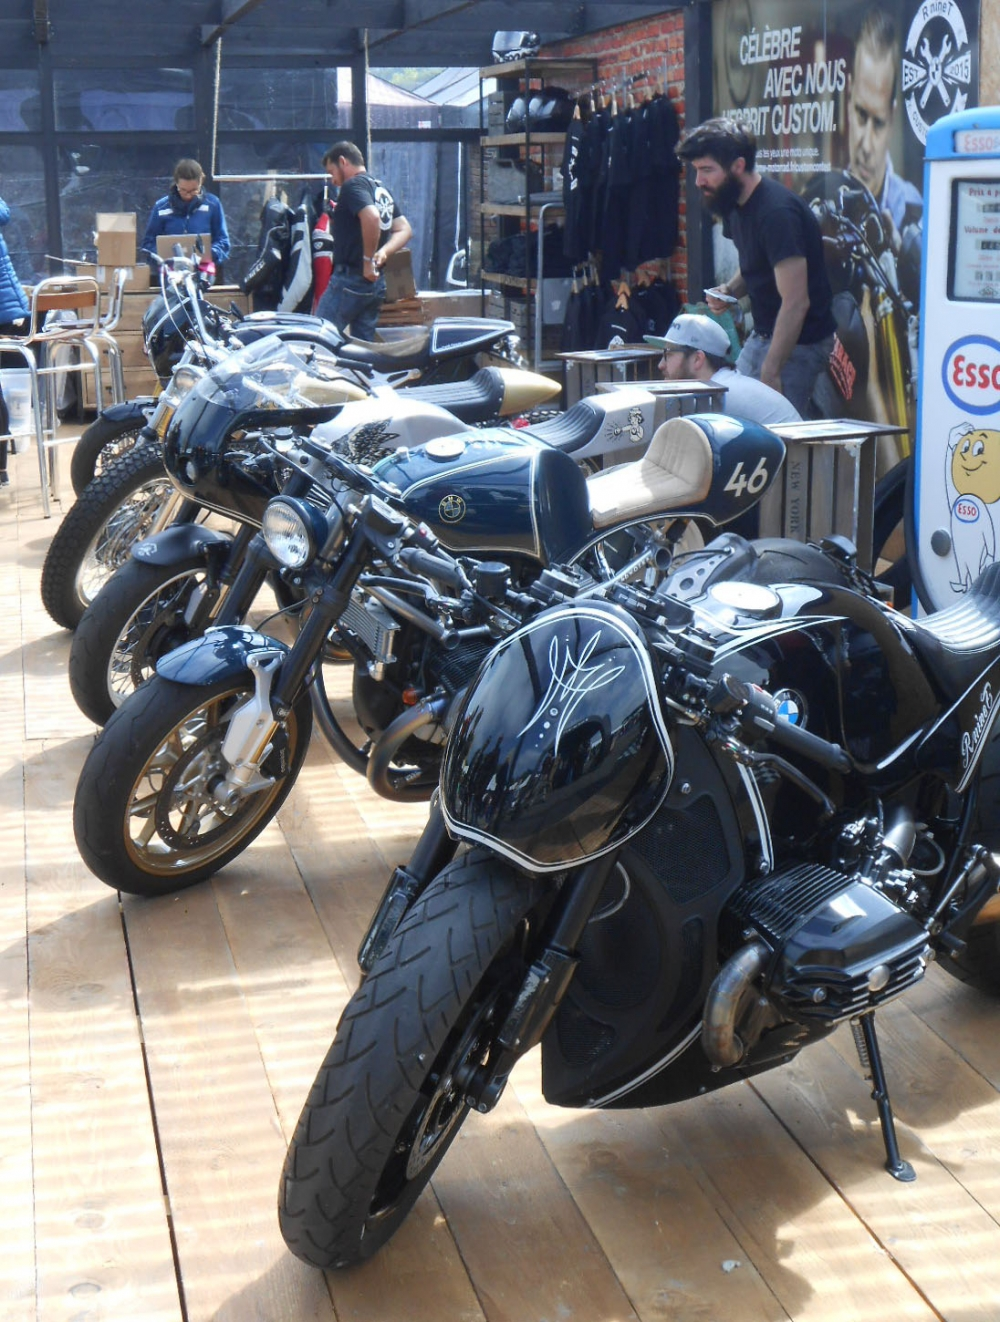 cafe racer montlhery paris france motorcycle tour. Black Bedroom Furniture Sets. Home Design Ideas